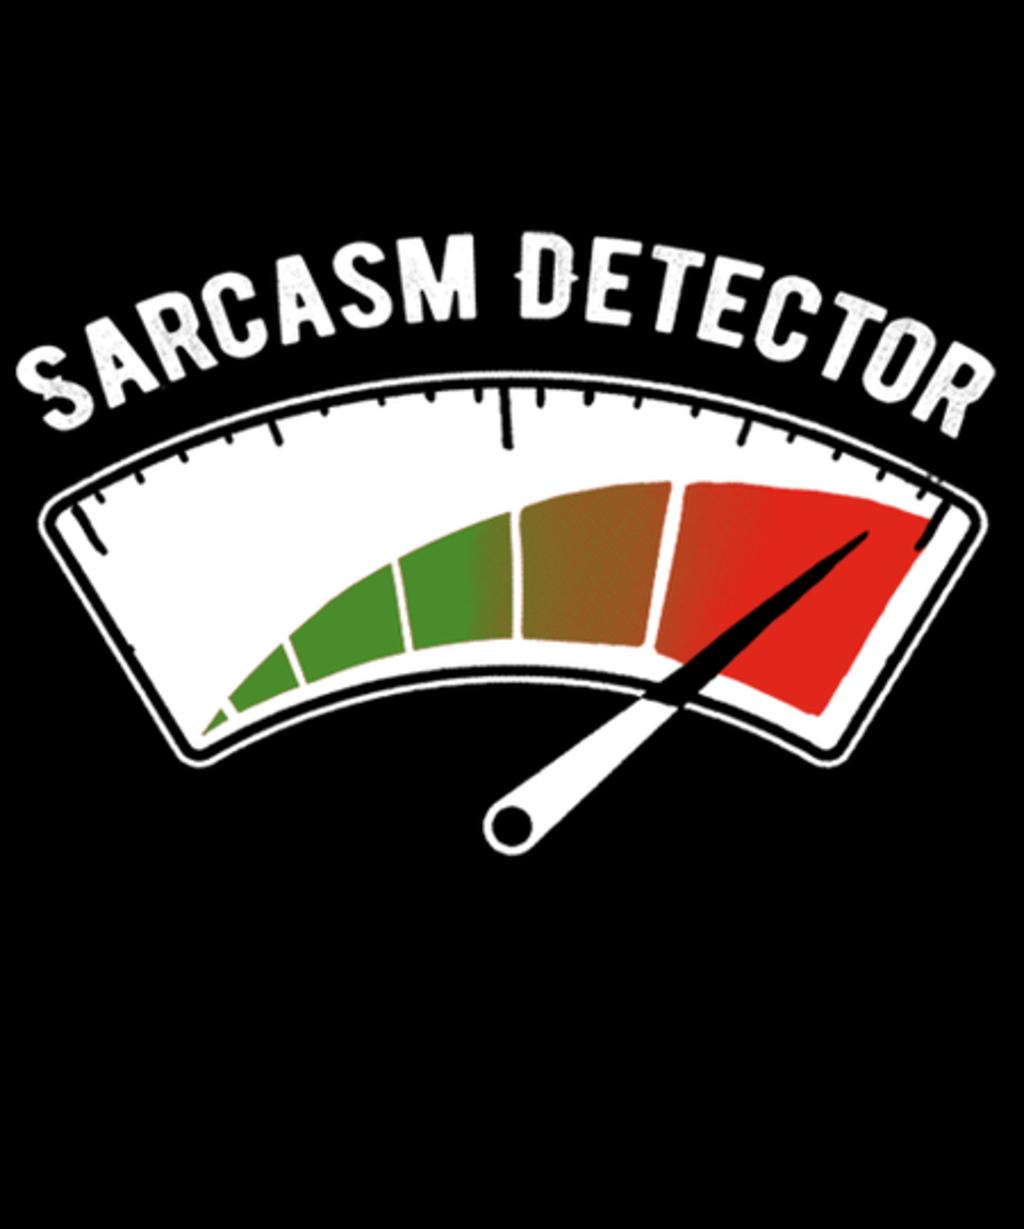 Qwertee: Sarcasm Detector